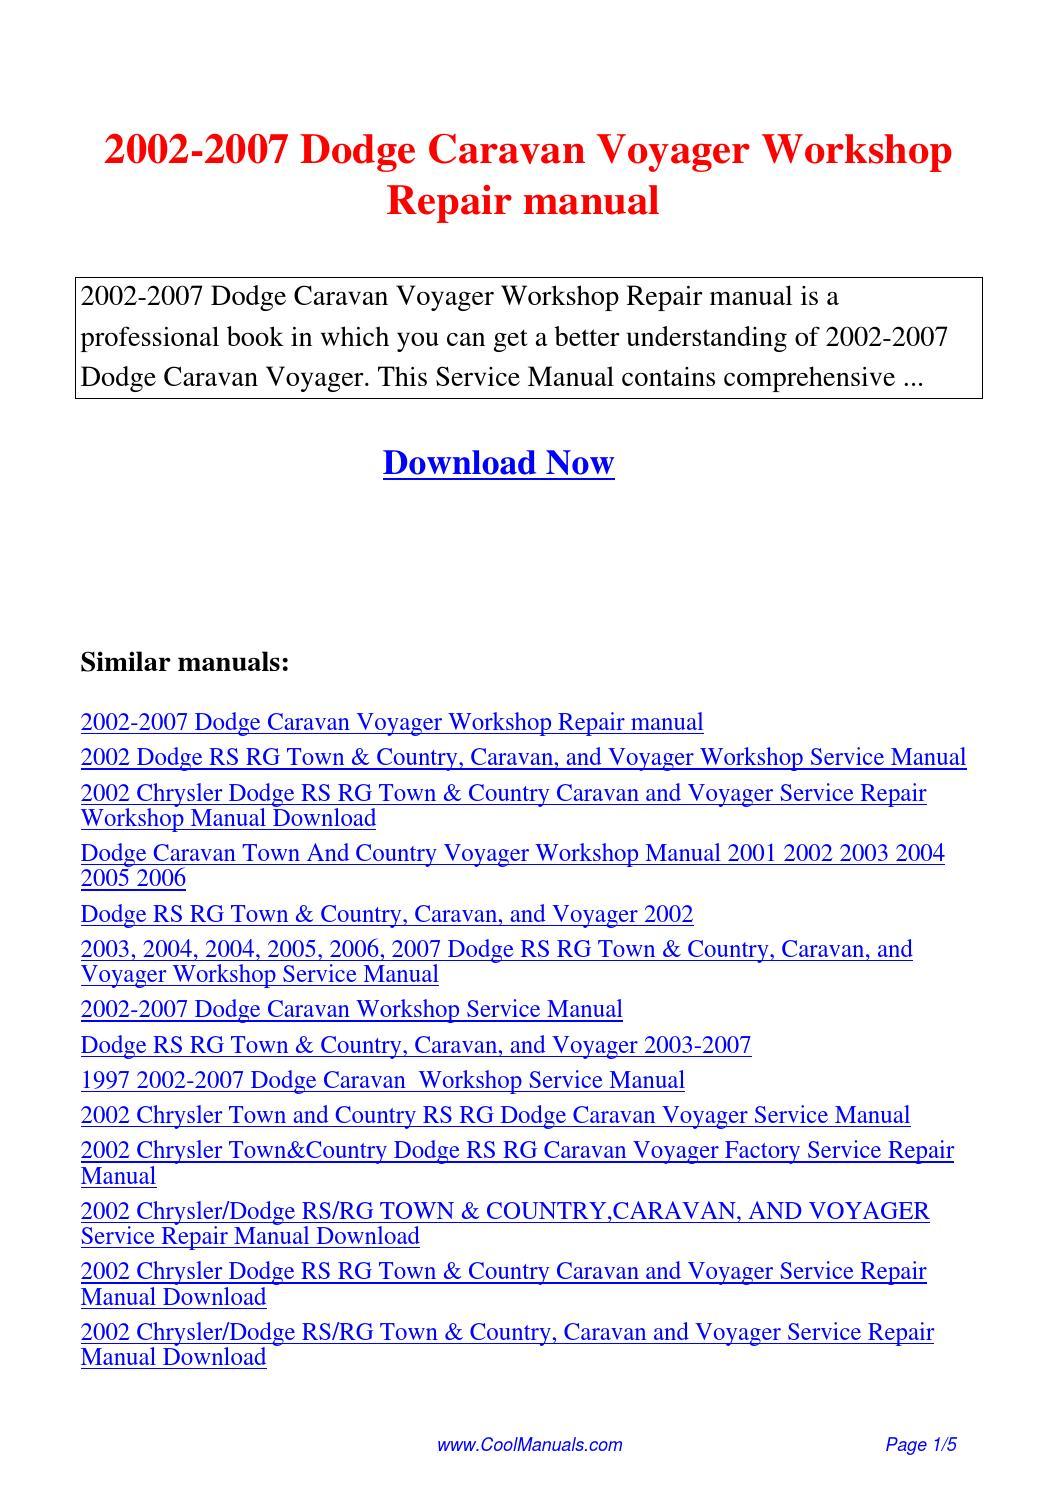 hight resolution of 2002 2007 dodge caravan voyager workshop repair manual pdf